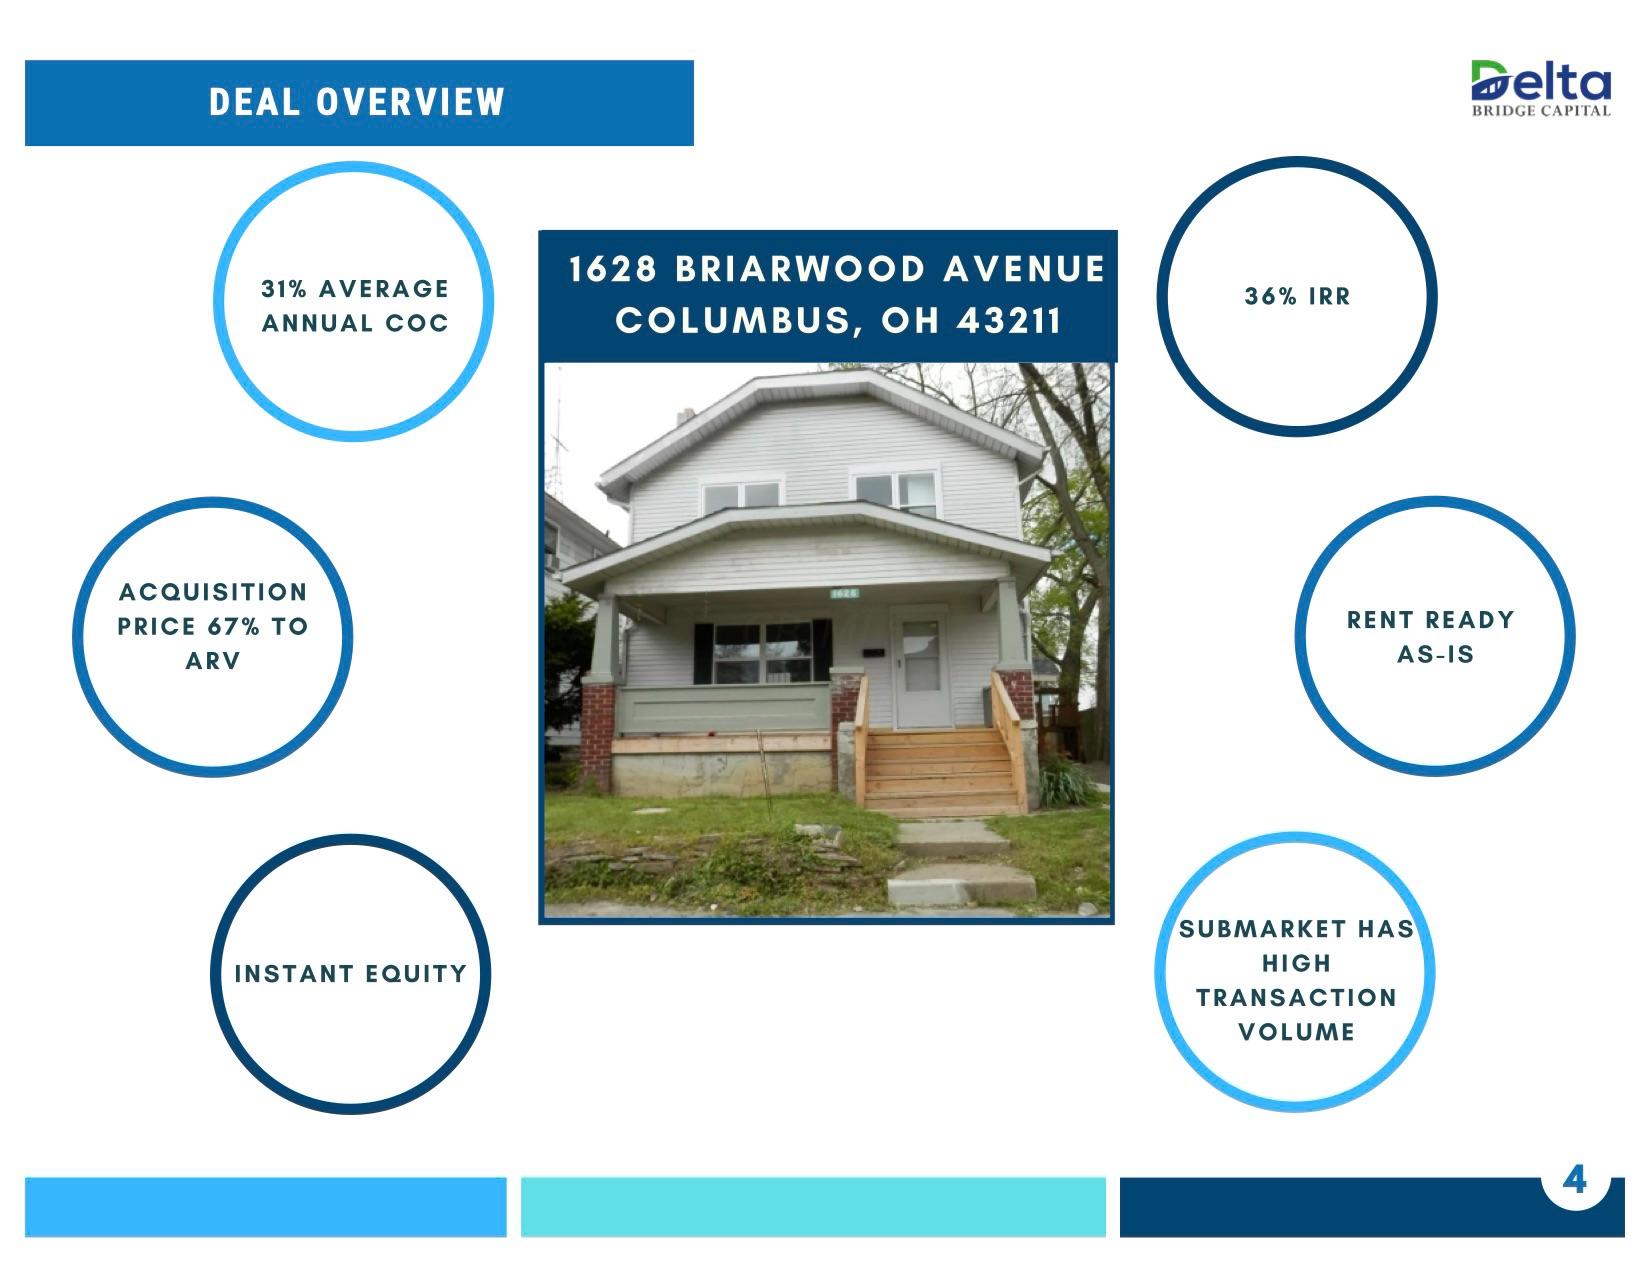 1628 Briarwood Avenue, Columbus, OH